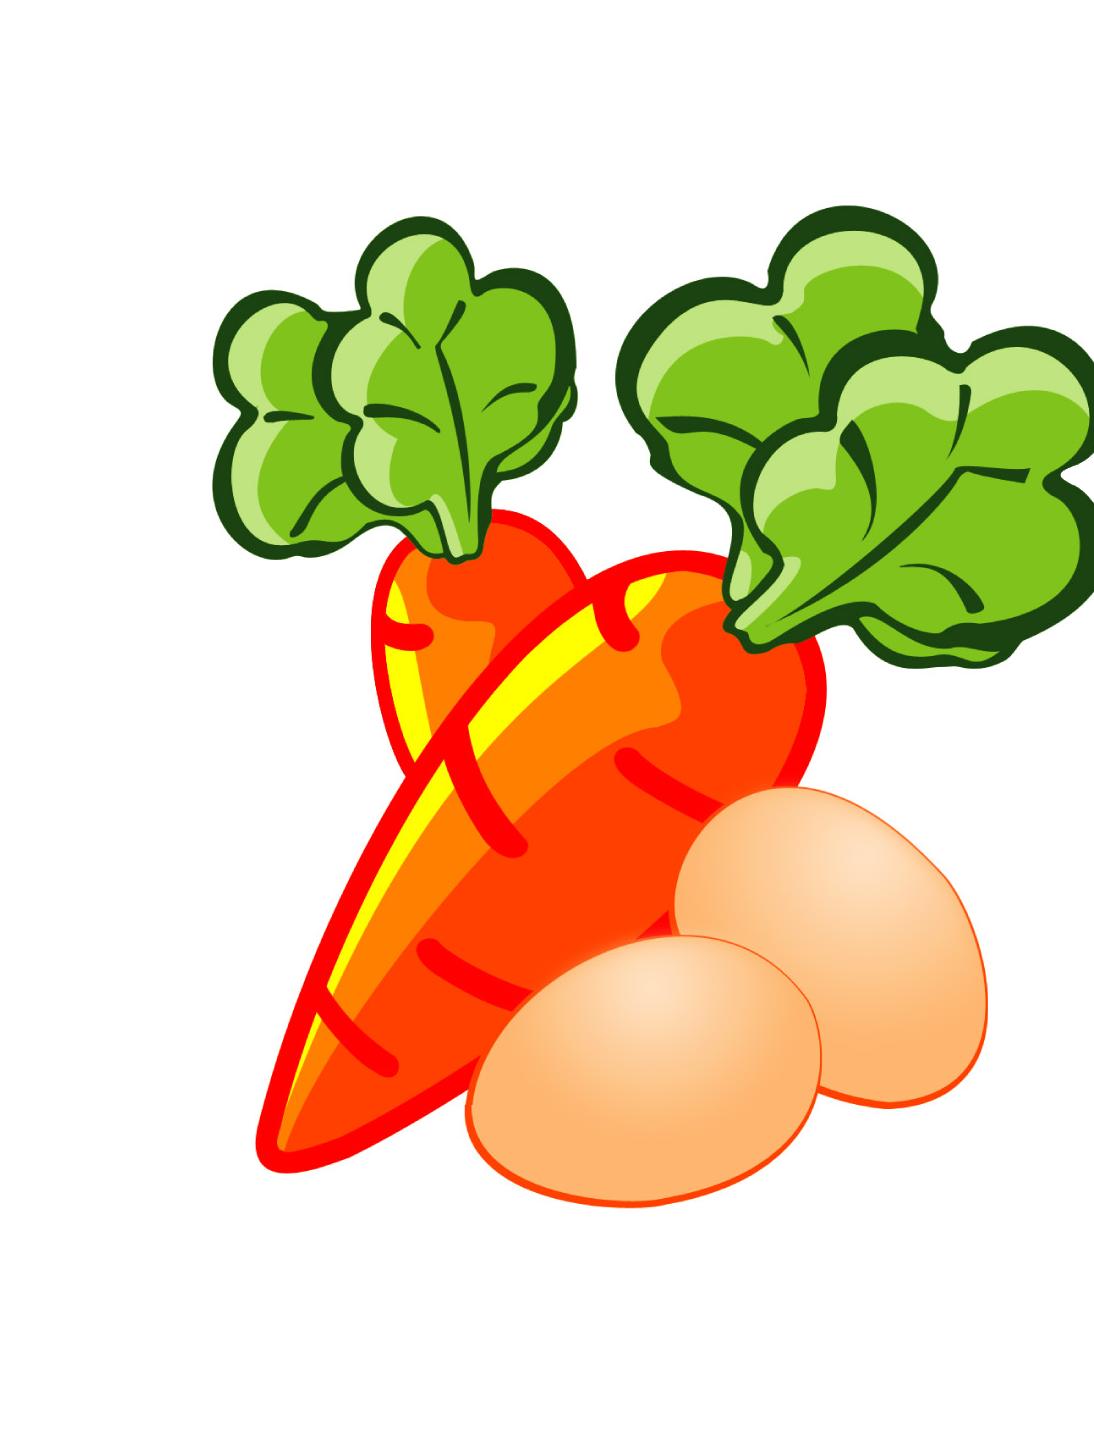 Chicken egg food illustration. Foods clipart carrot